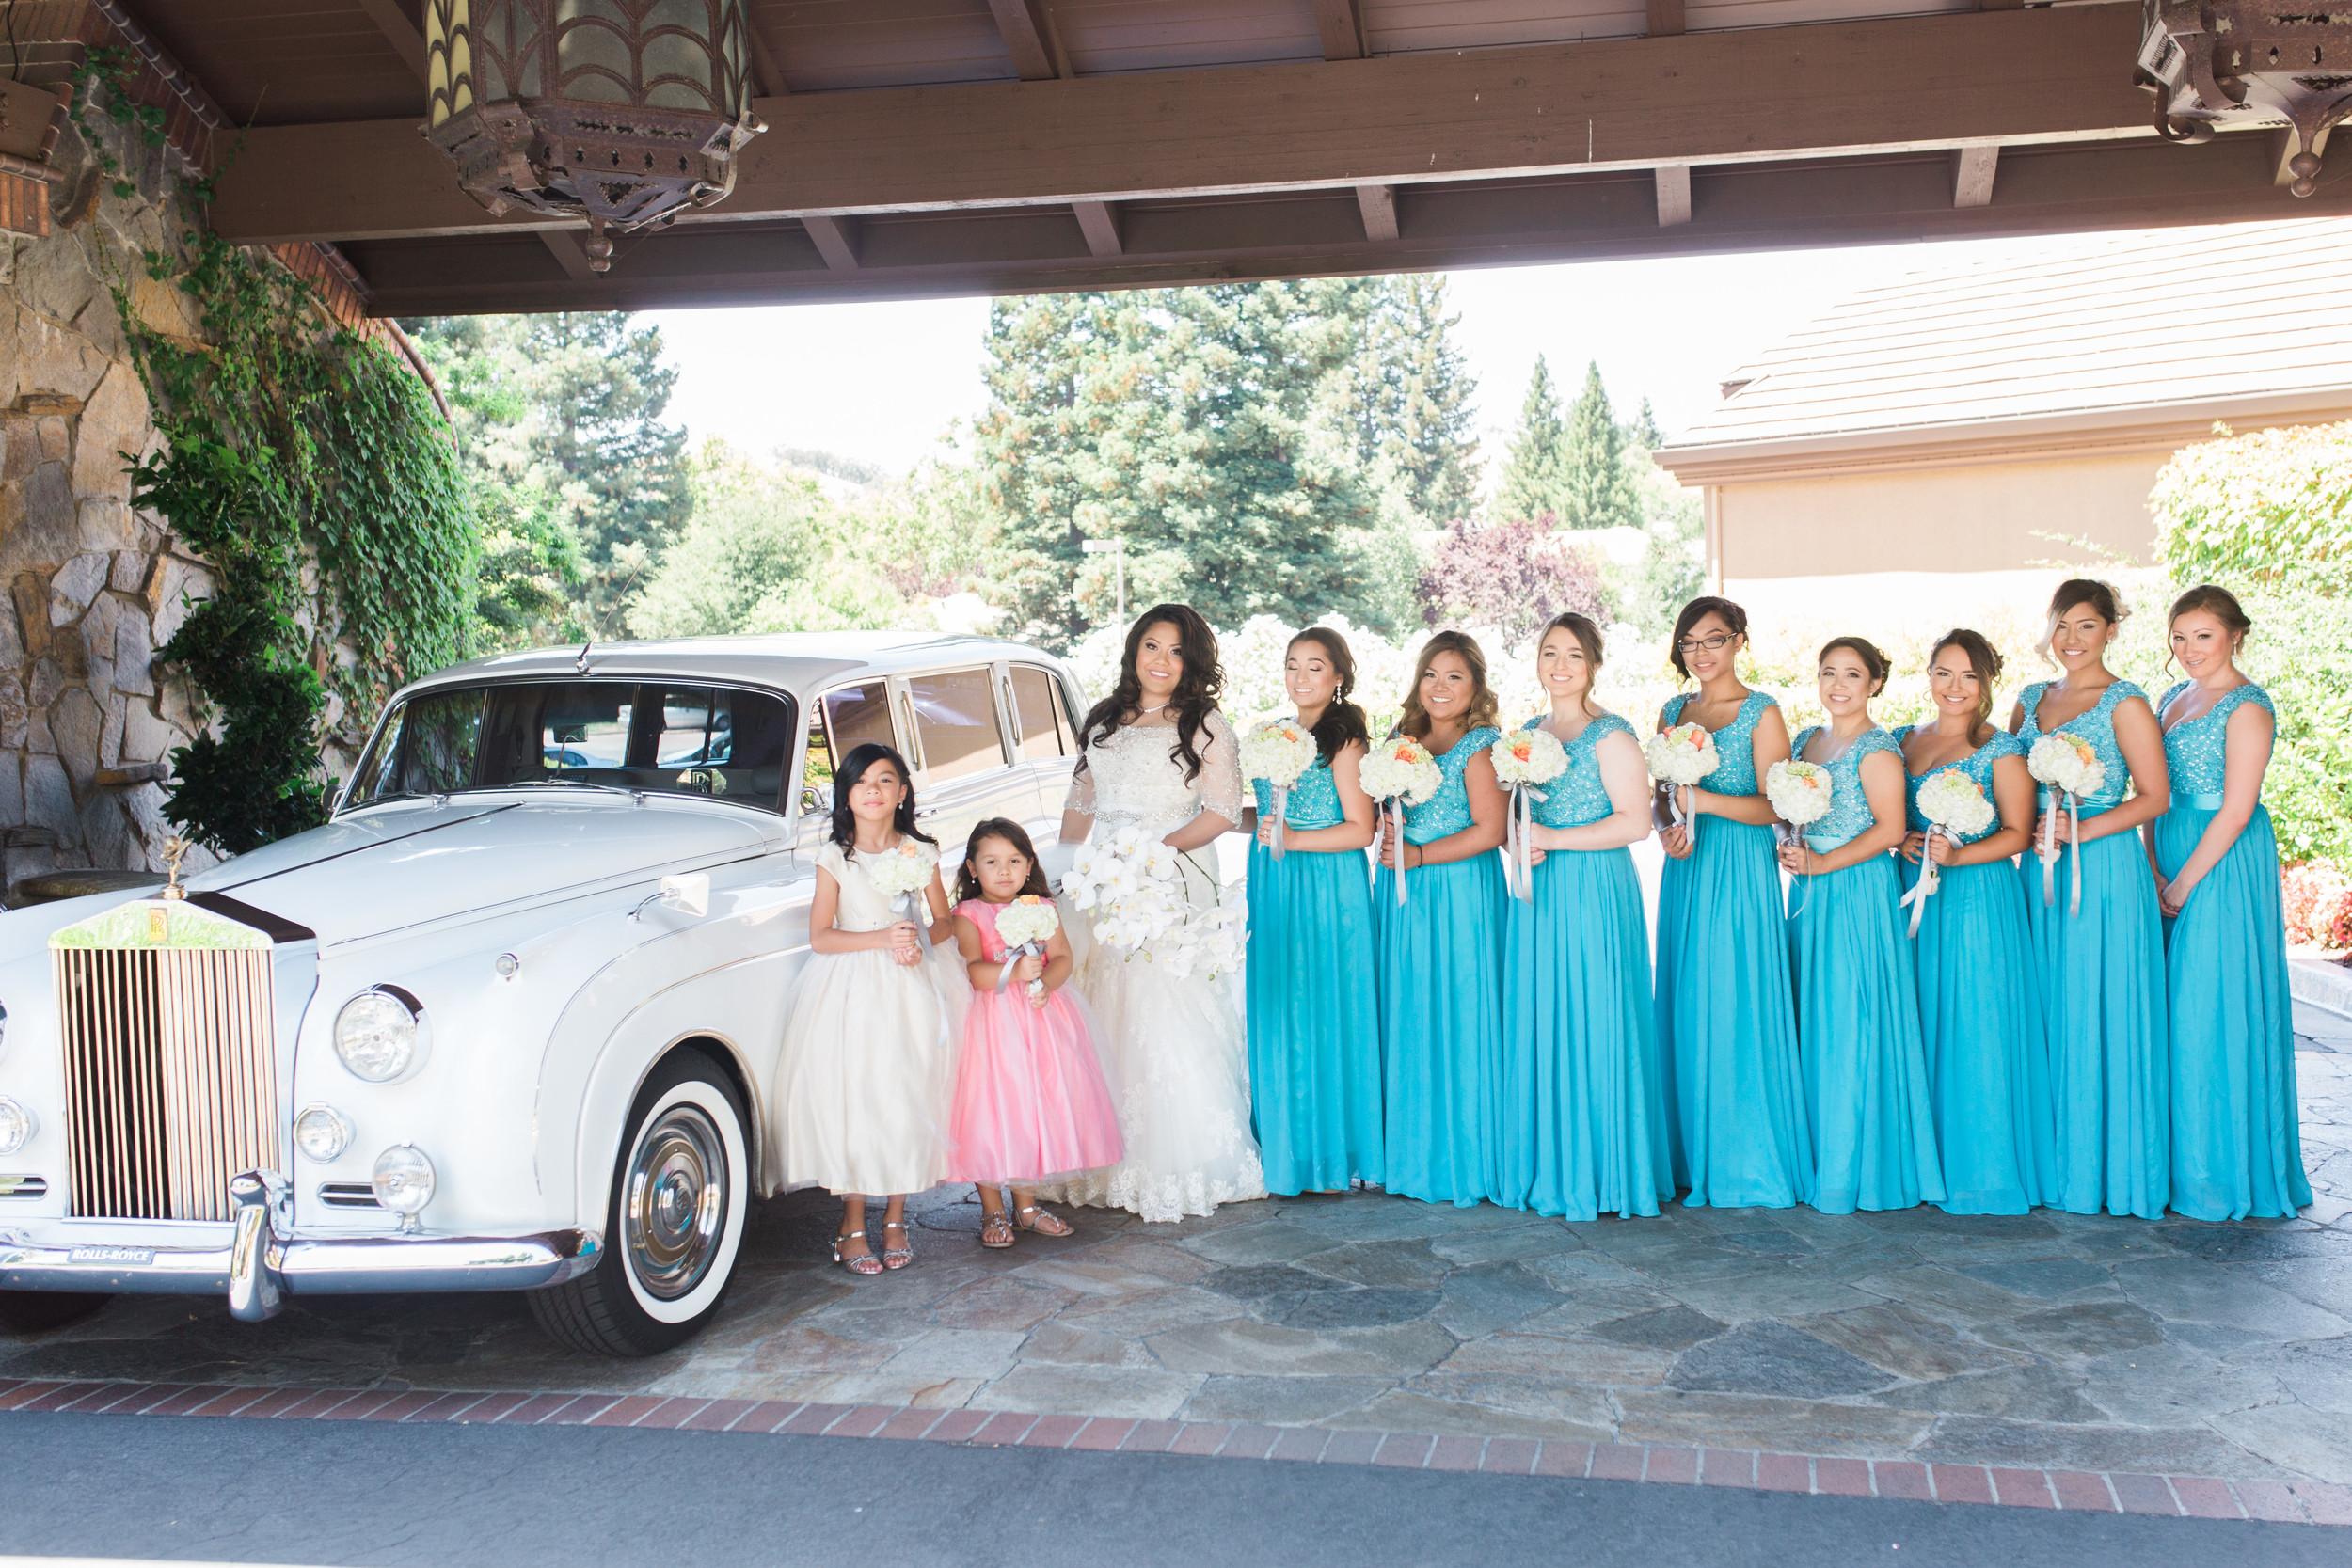 hawaiian-inspired-wedding-at-blackhawk-country-club-1661.jpg